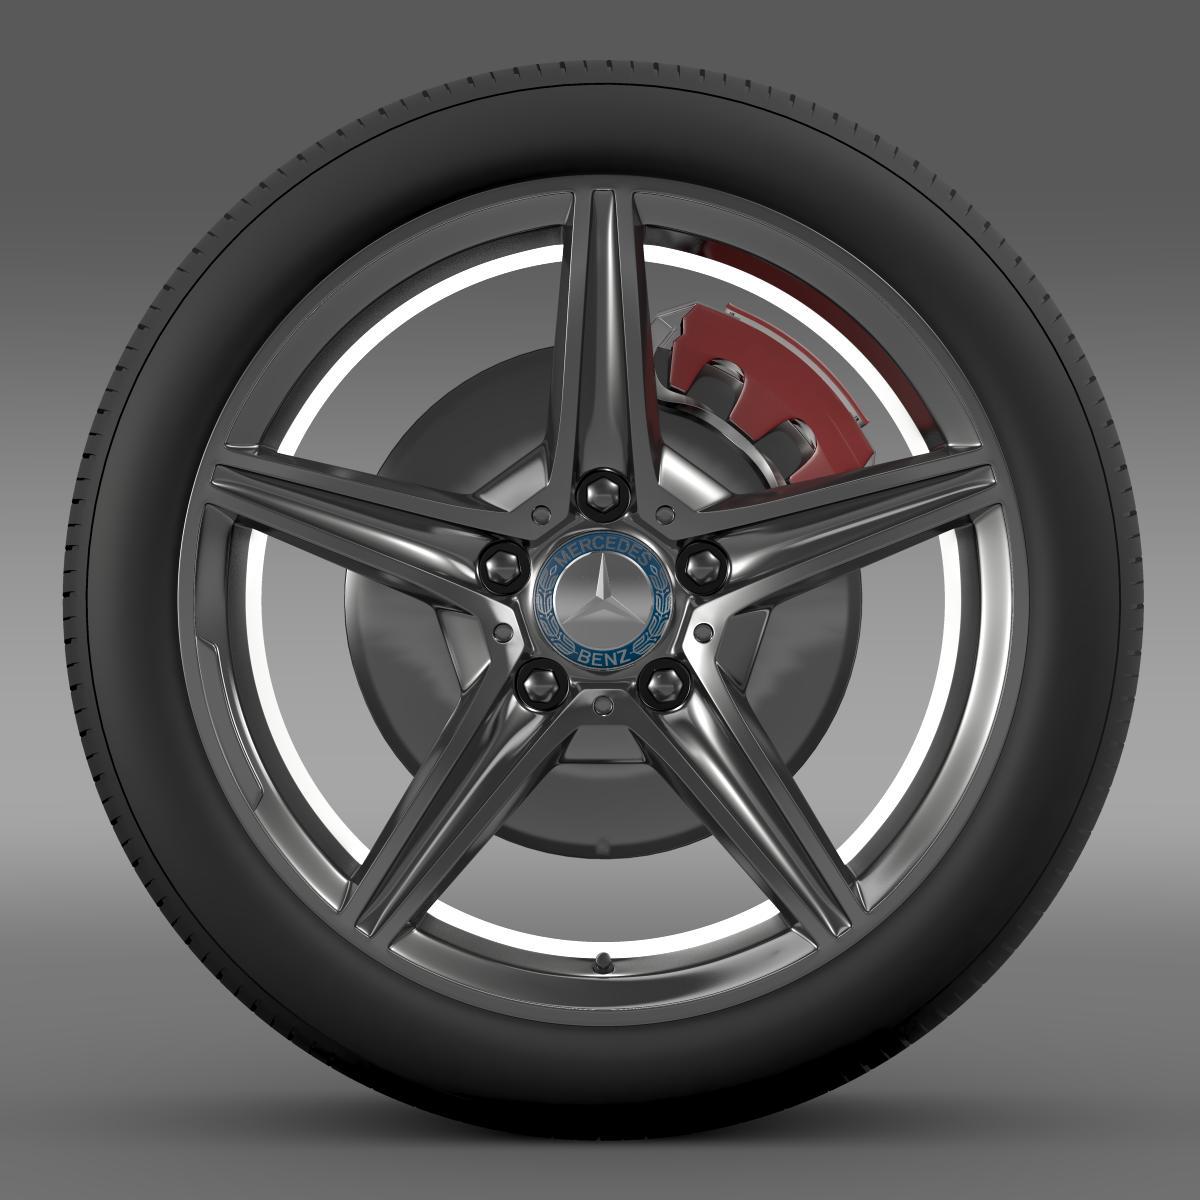 mercedes benz c 400 4matic amg line wheel 3d model 3ds max fbx c4d lwo ma mb hrc xsi obj 210785